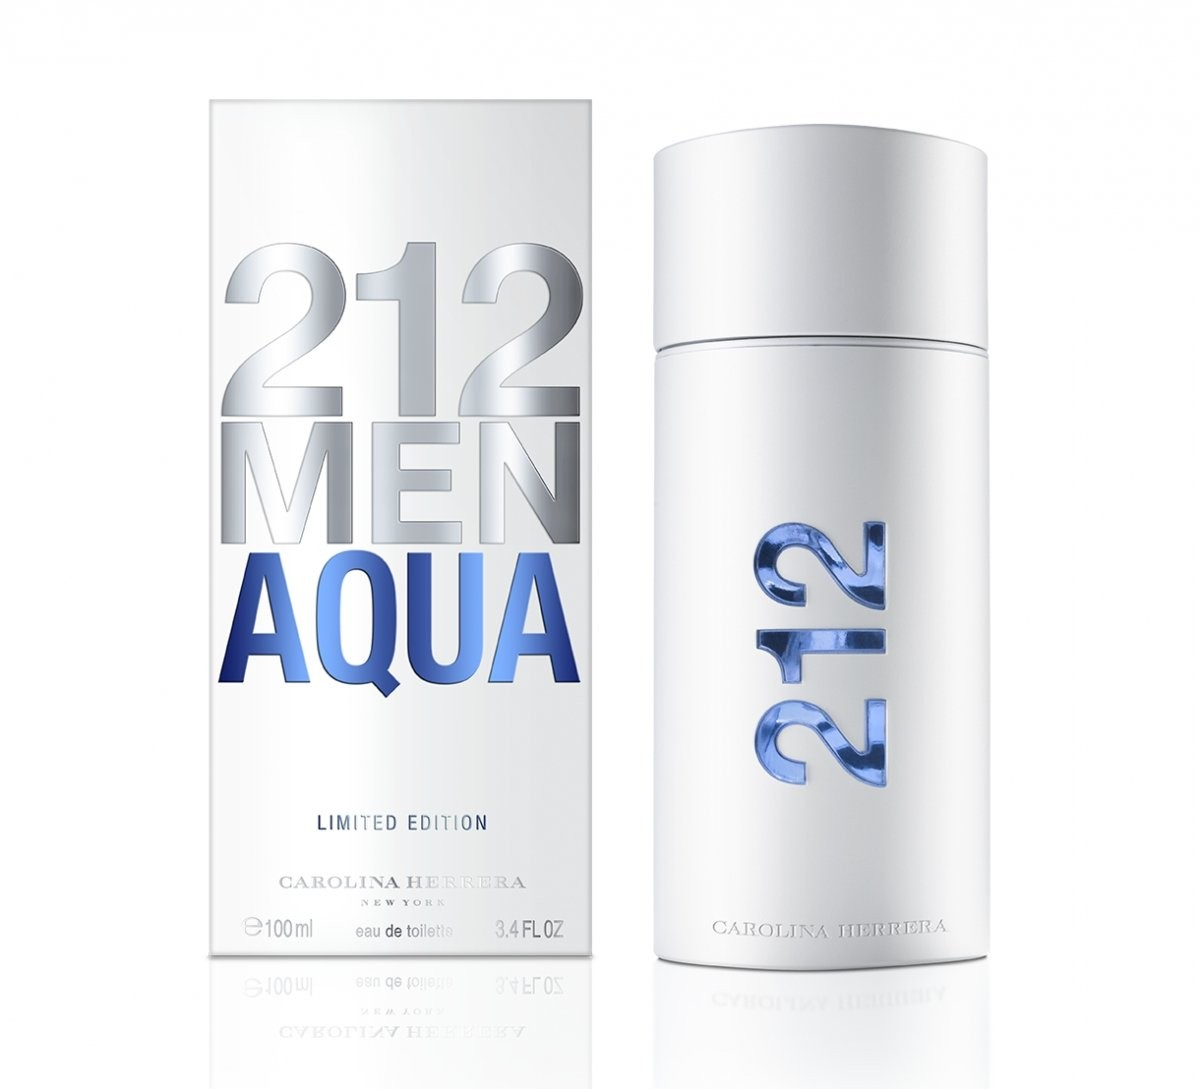 Carolina Herrera 212 Men Aqua аромат для мужчин